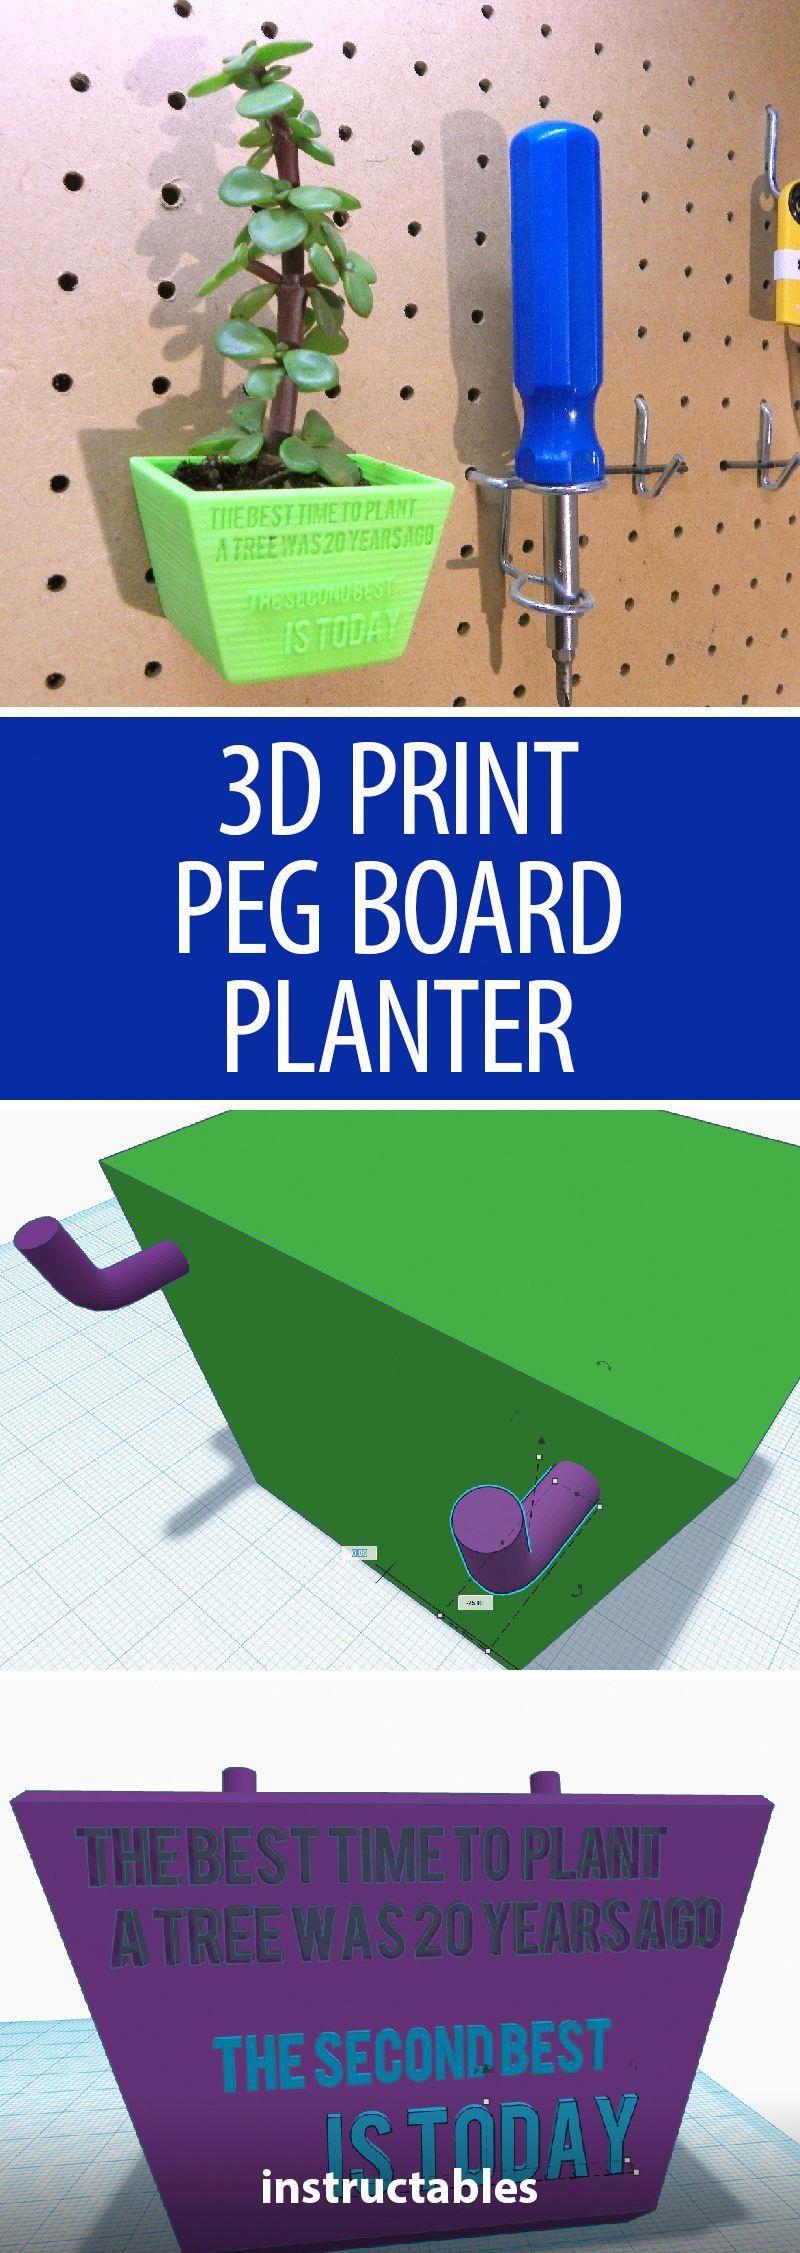 TinkerCAD 3D Print Peg Board Planter 3dprinting 3d